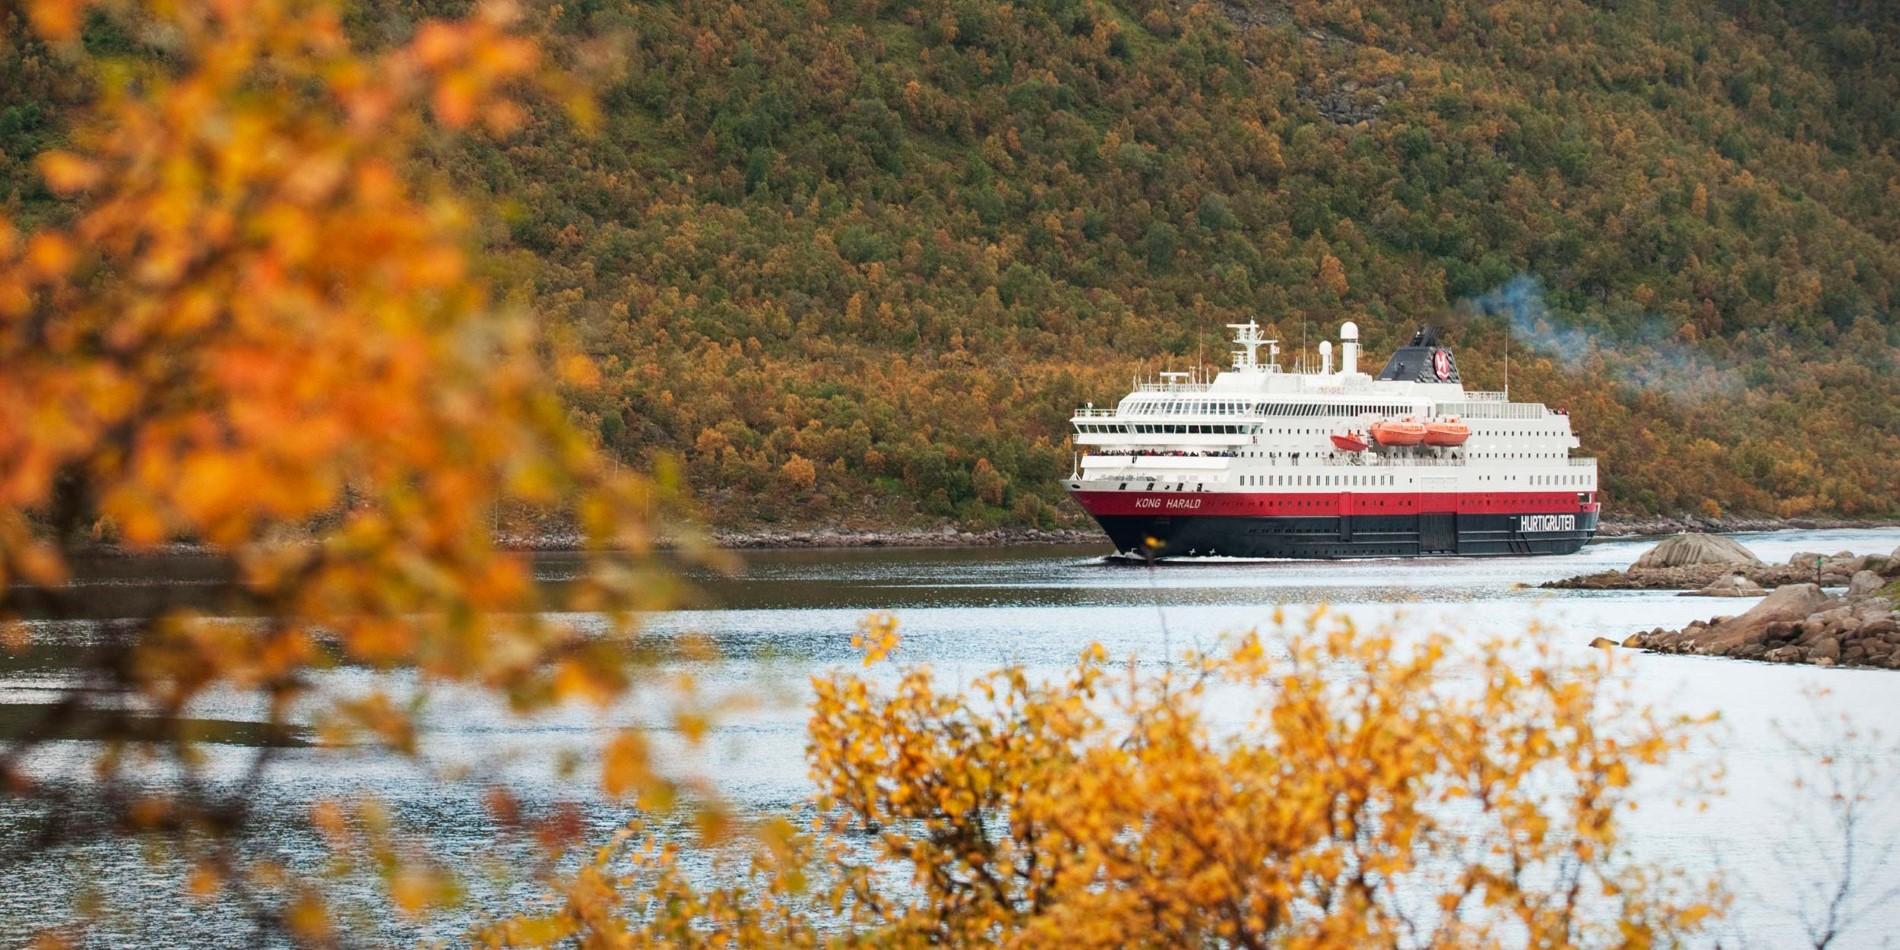 Careers - Maritime vacancies | Hurtigruten | Hurtigruten